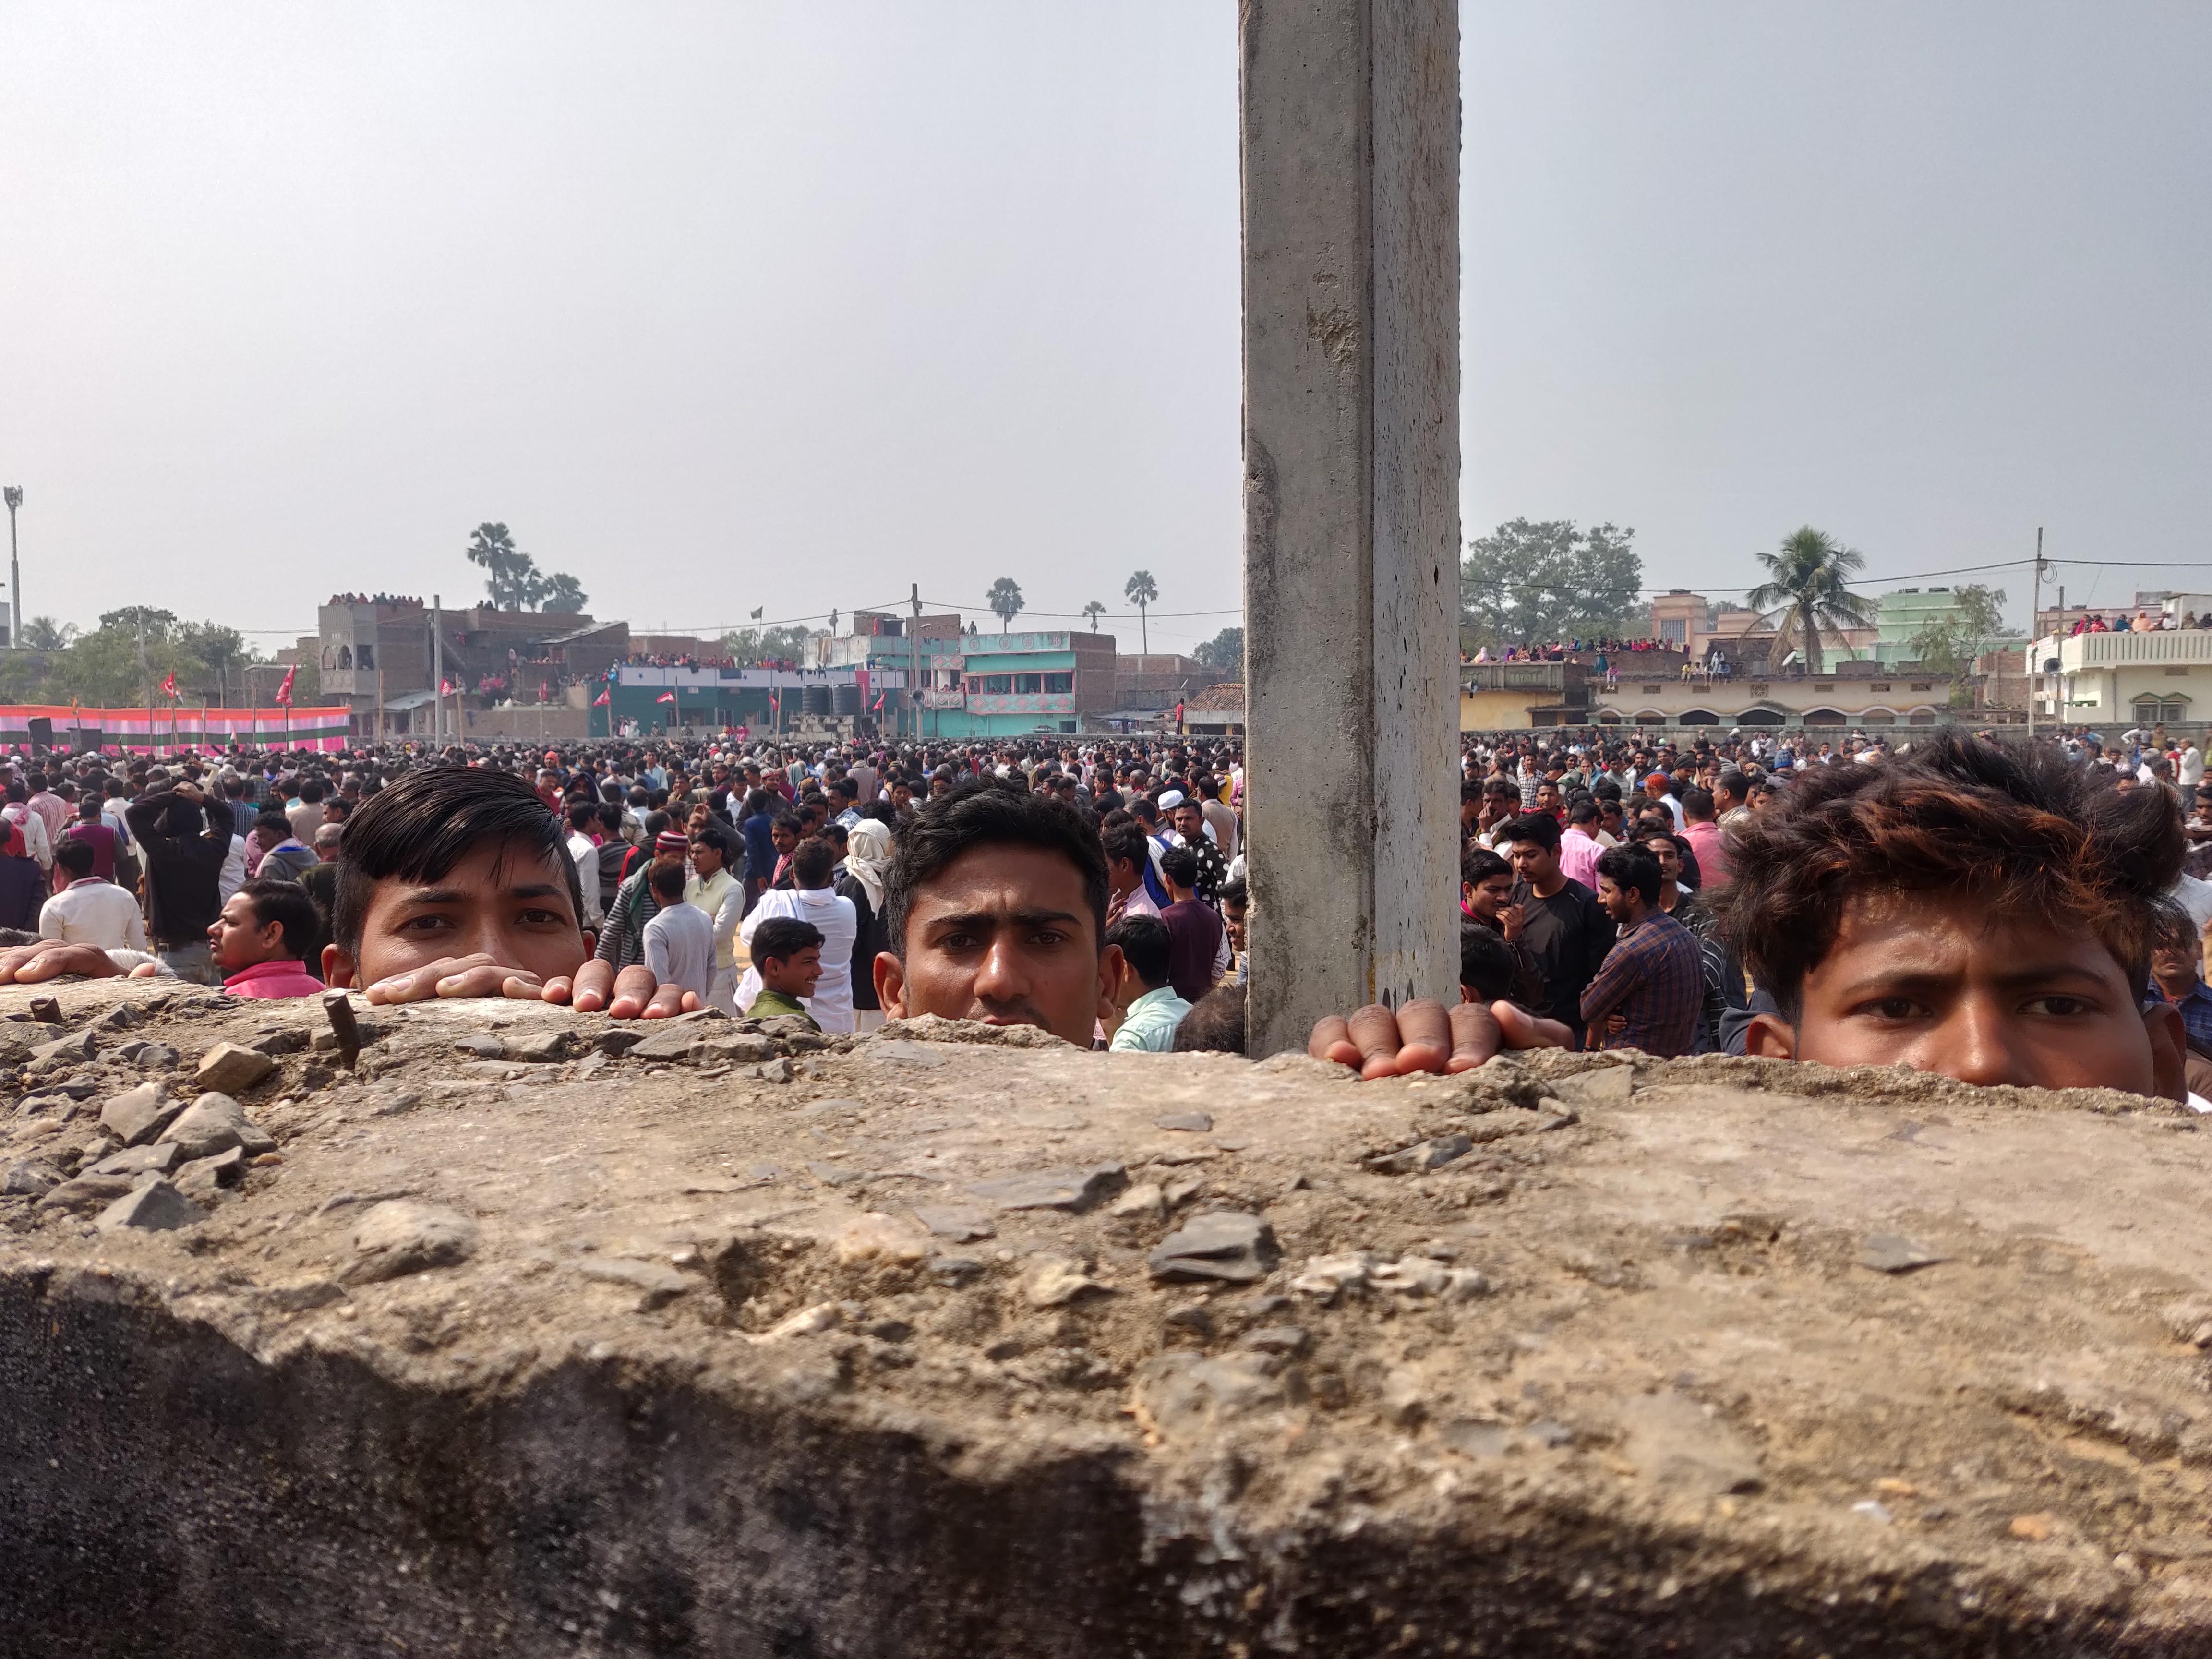 Spectators, anti-CAA yatra in Munger, India, 2020 | J-T.M.